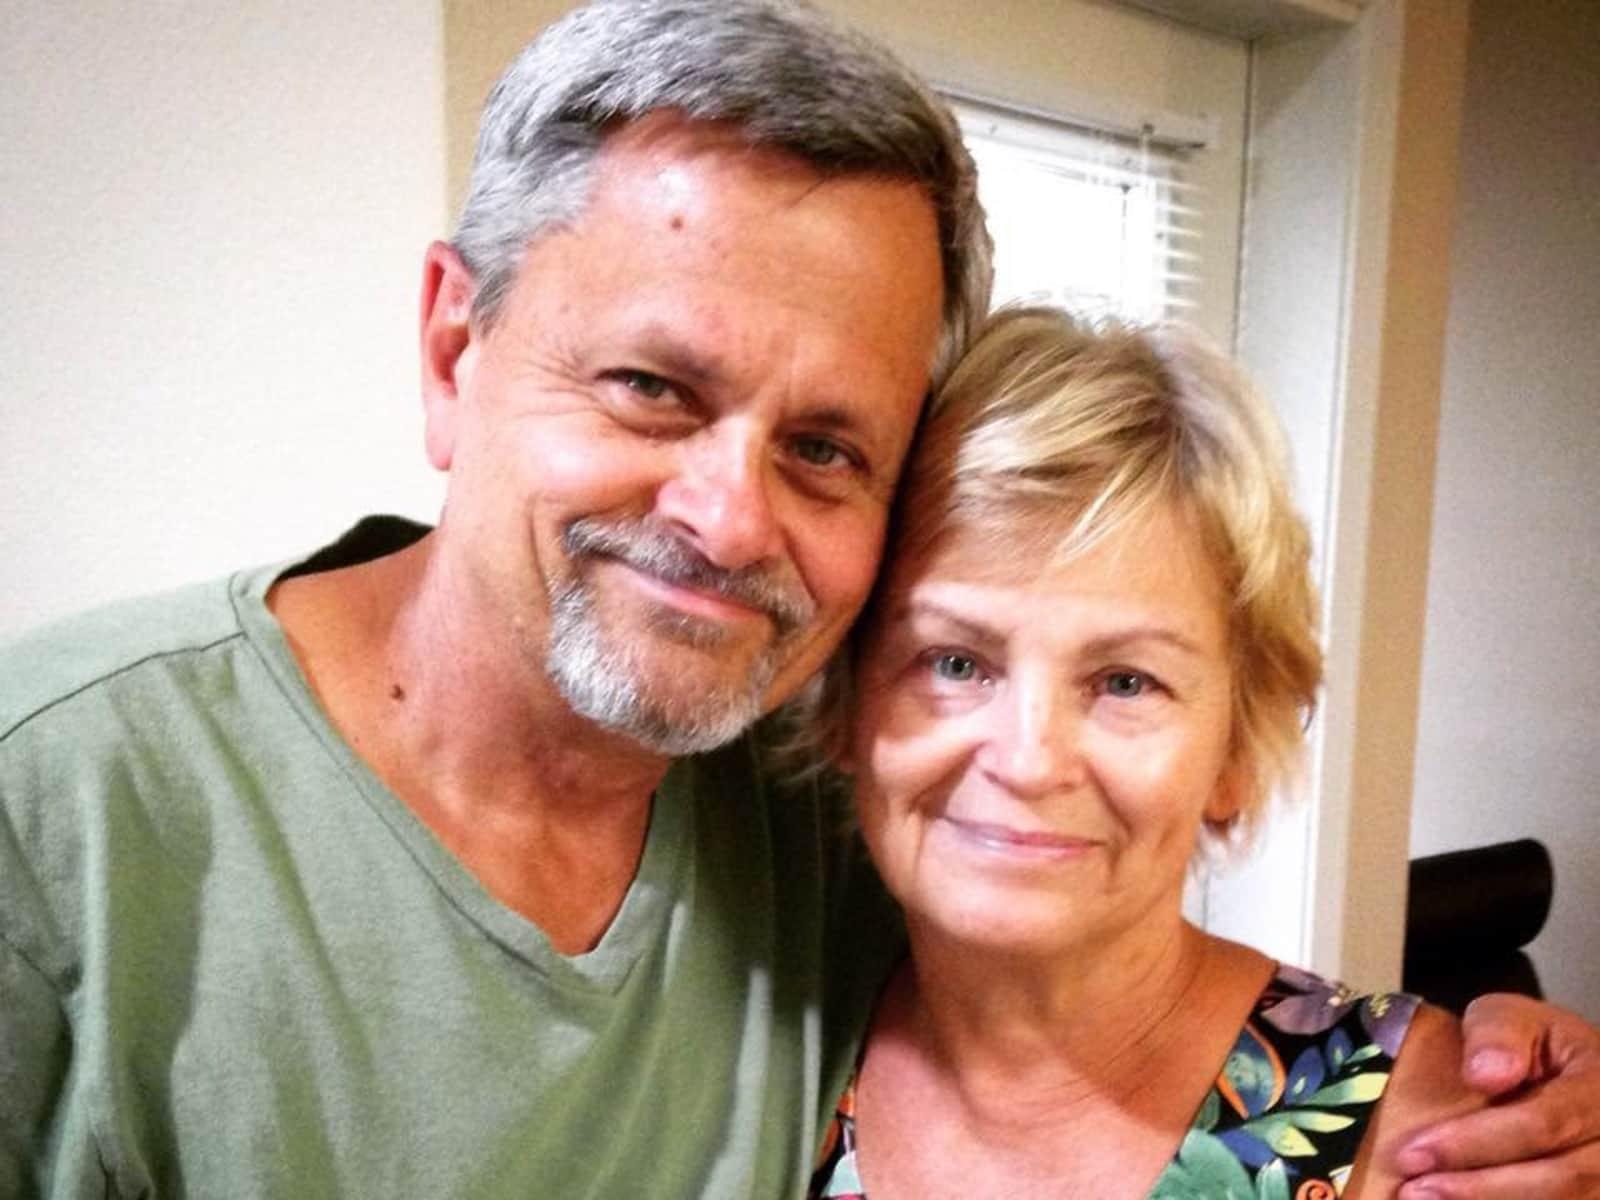 Maureen & Michael from Ajijic, Mexico